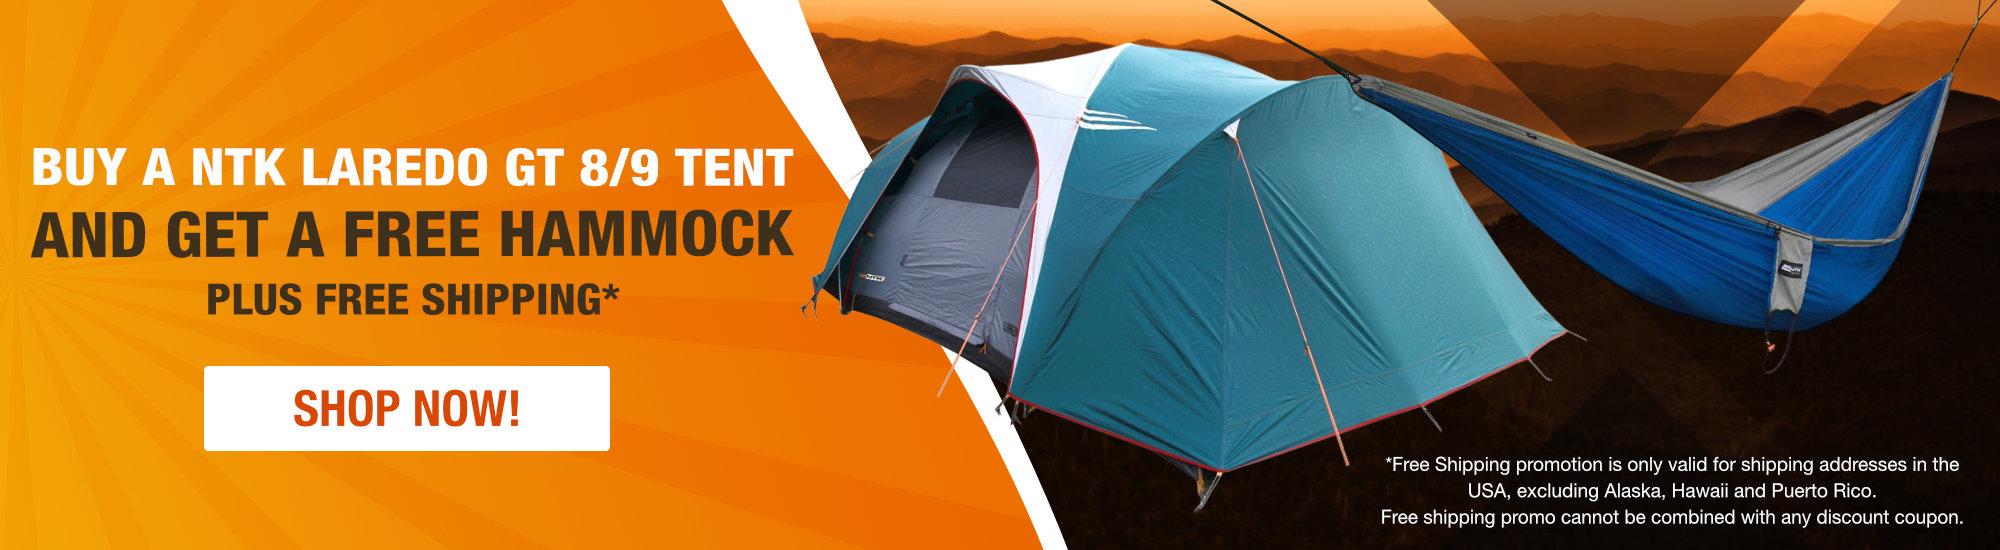 NTK Laredo GT 8/9 person Tent plus free hammock!